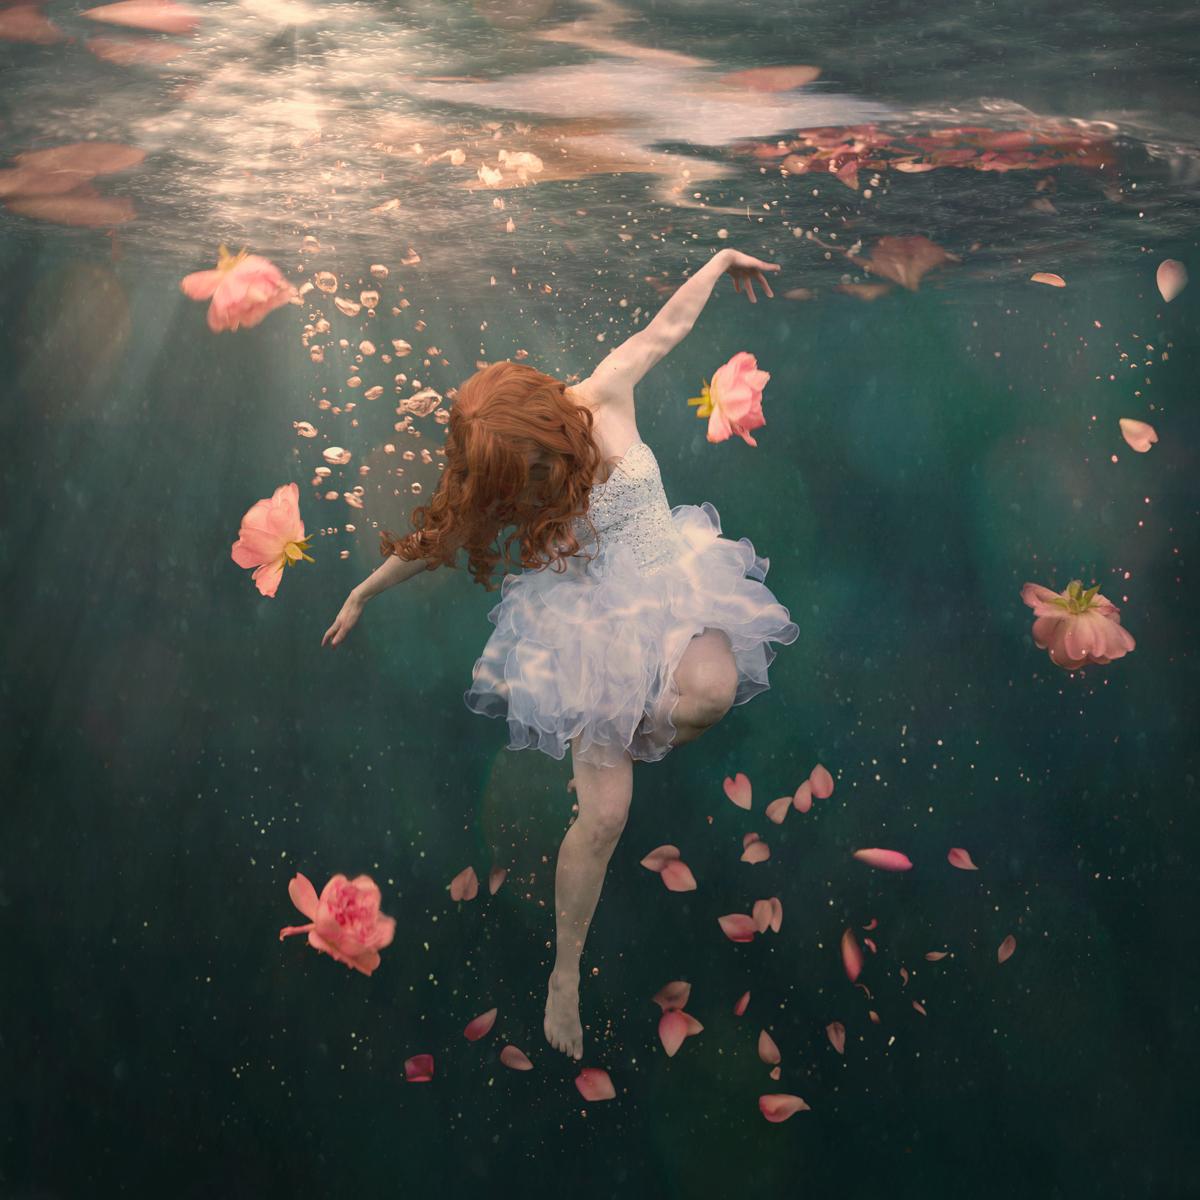 rosewater-no-wm